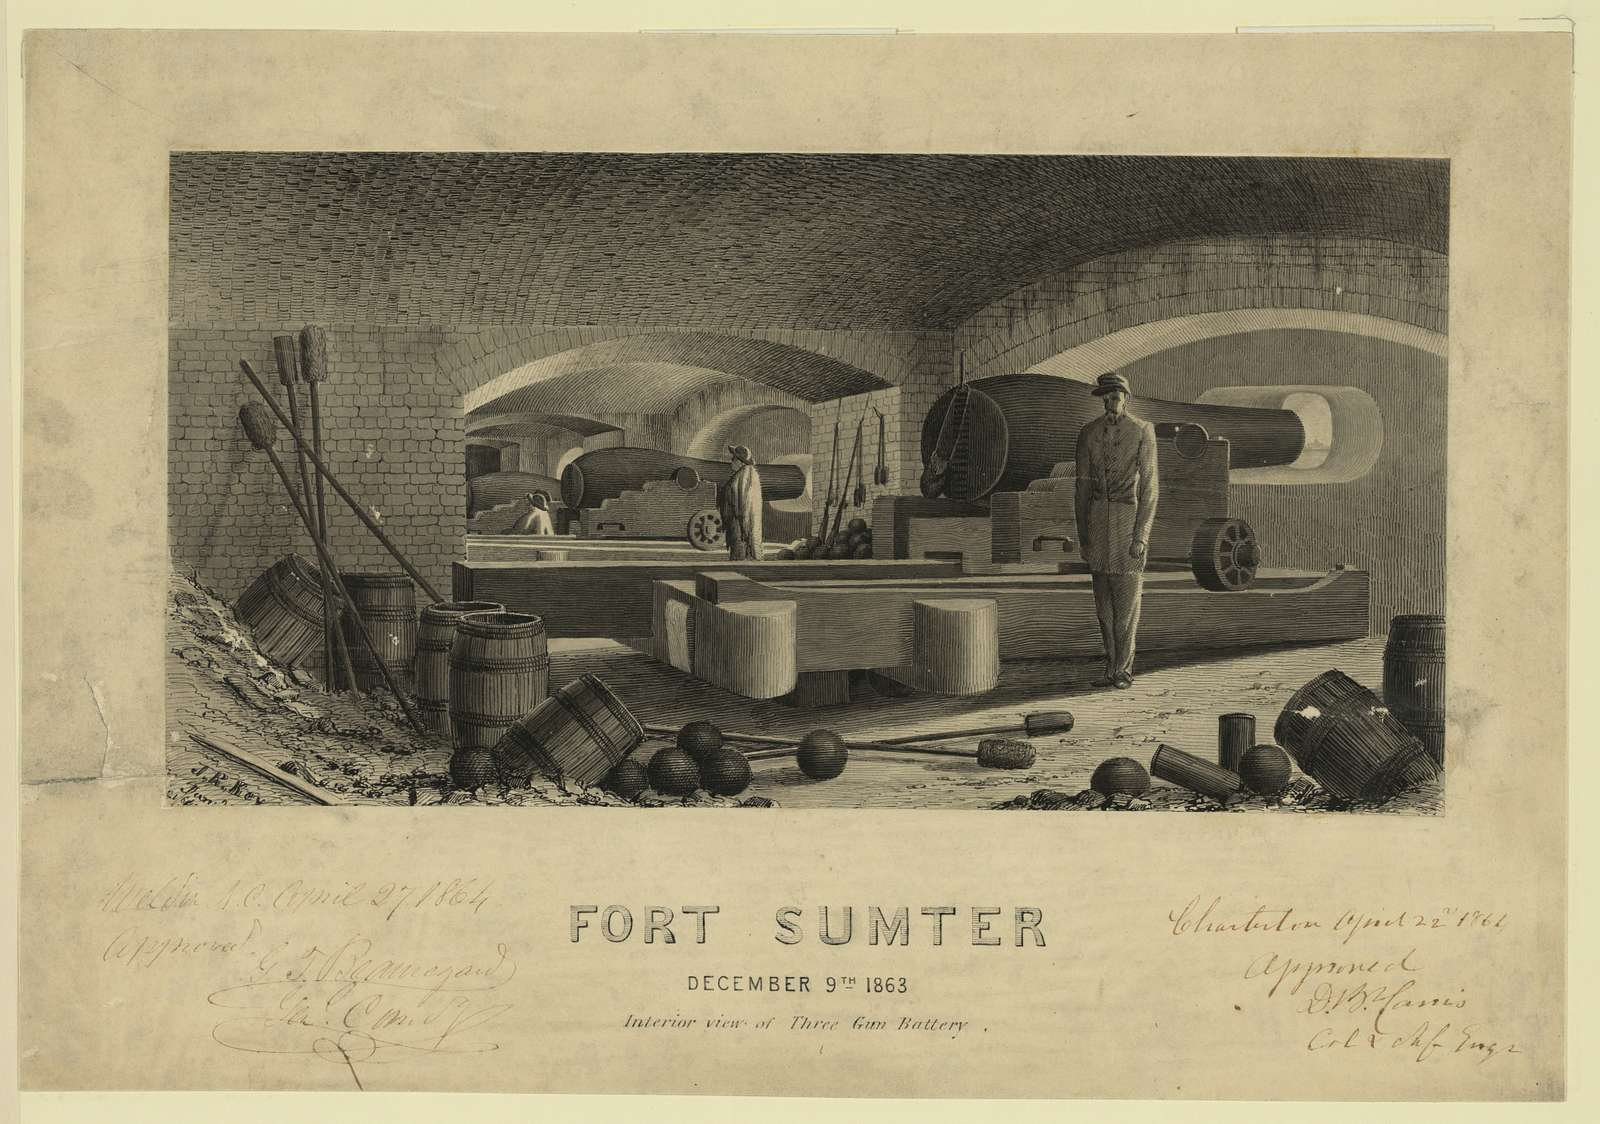 Fort Sumter, December 9th 1863, Interior view of Three Gun Battery